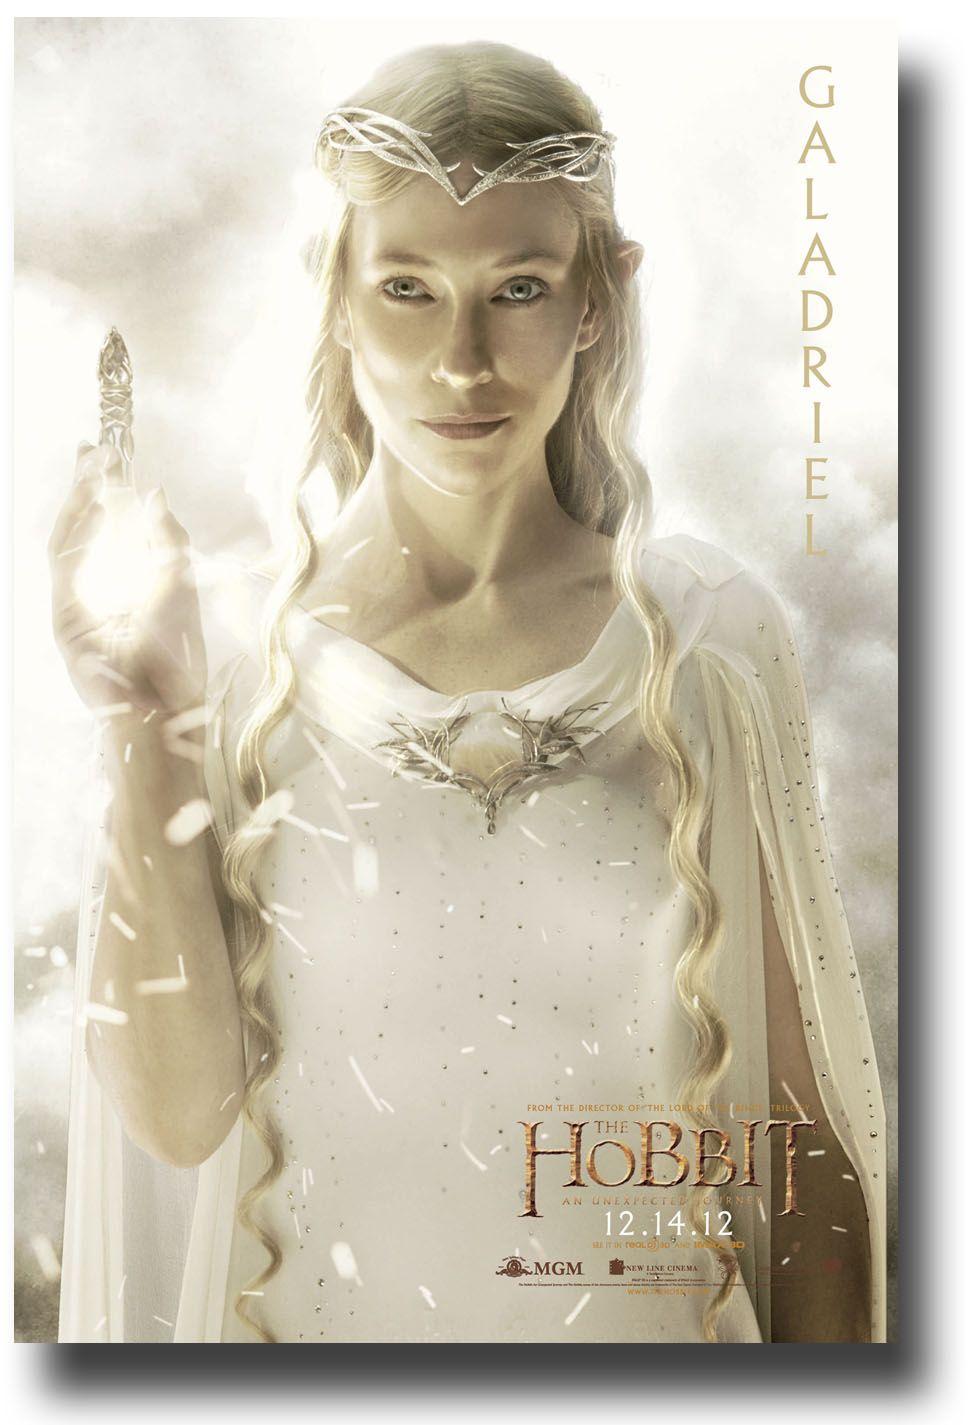 The Hobbit: An Unexpec...